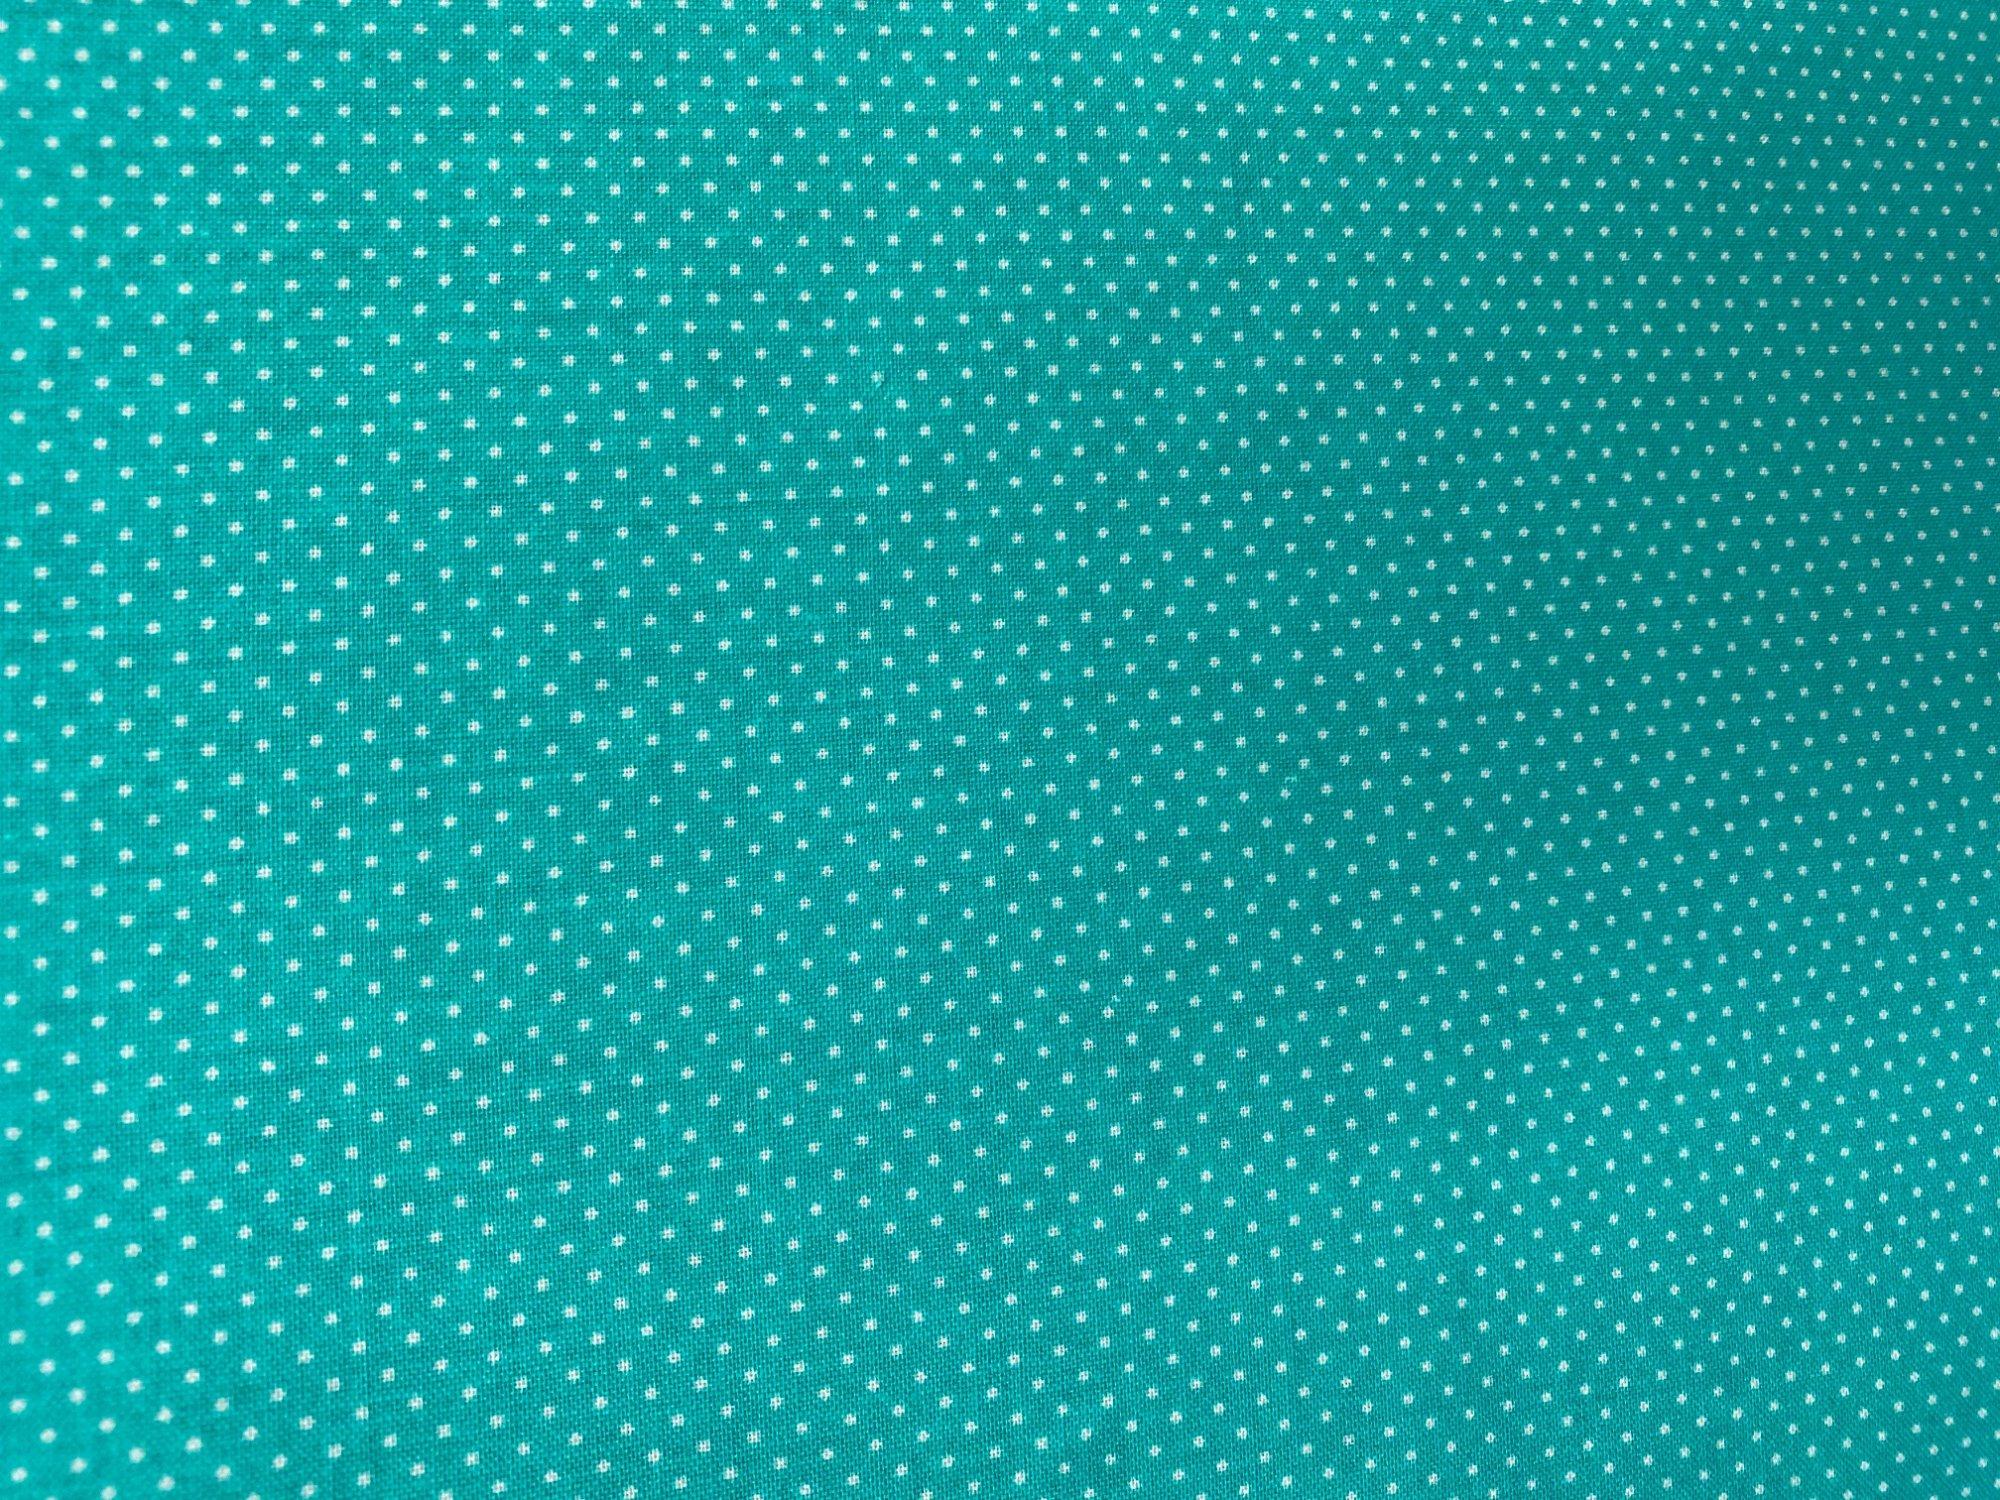 Choice Mini Dots Teal mini dots BD-20707-A39